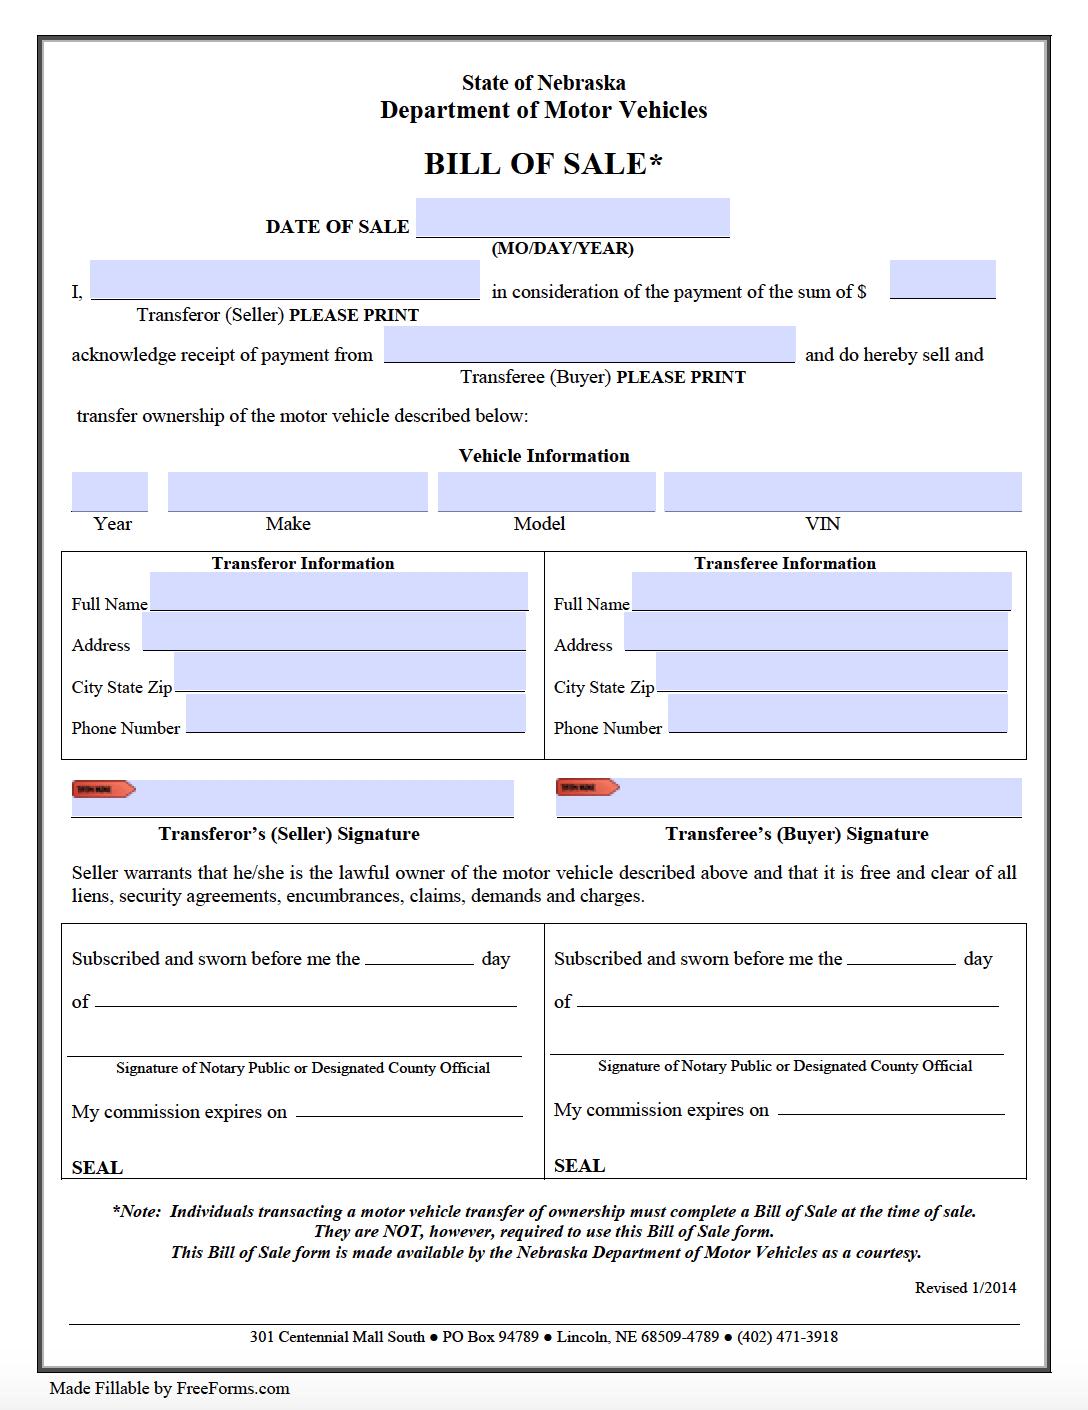 Free Nebraska Motor Vehicle Dmv Bill Of Sale Form Pdf